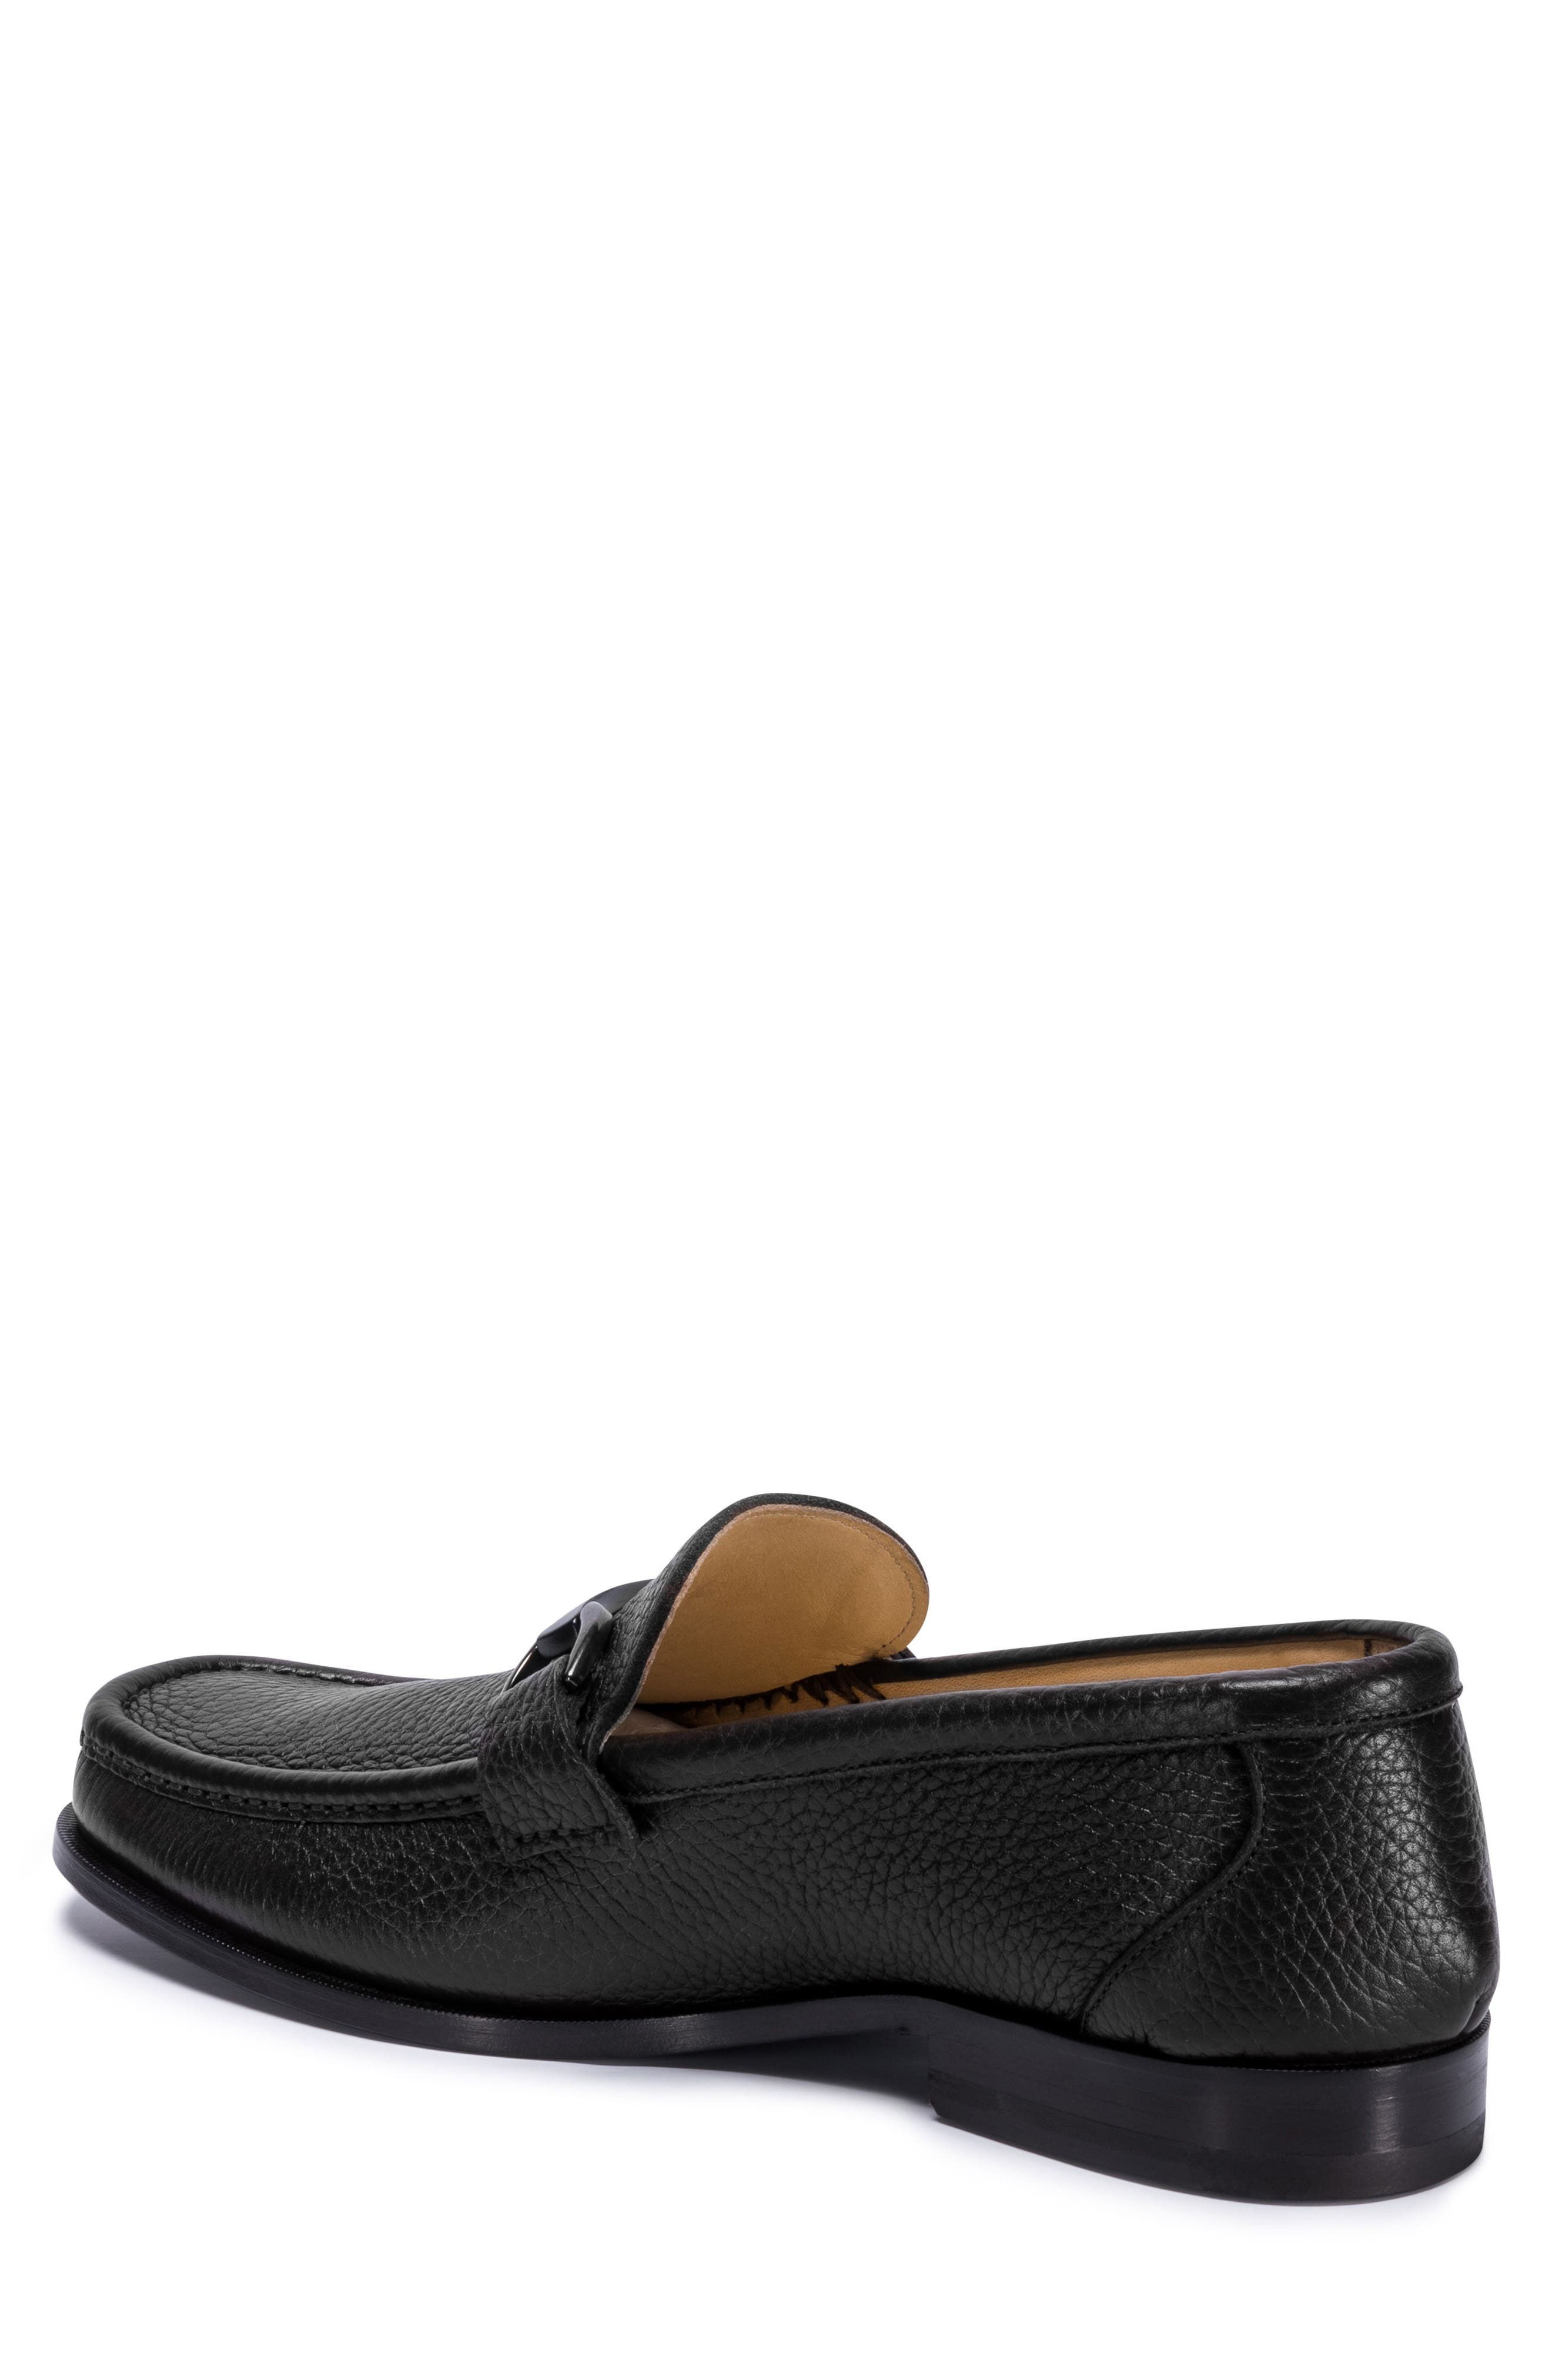 Padua Bit Loafer,                             Alternate thumbnail 2, color,                             NERO LEATHER